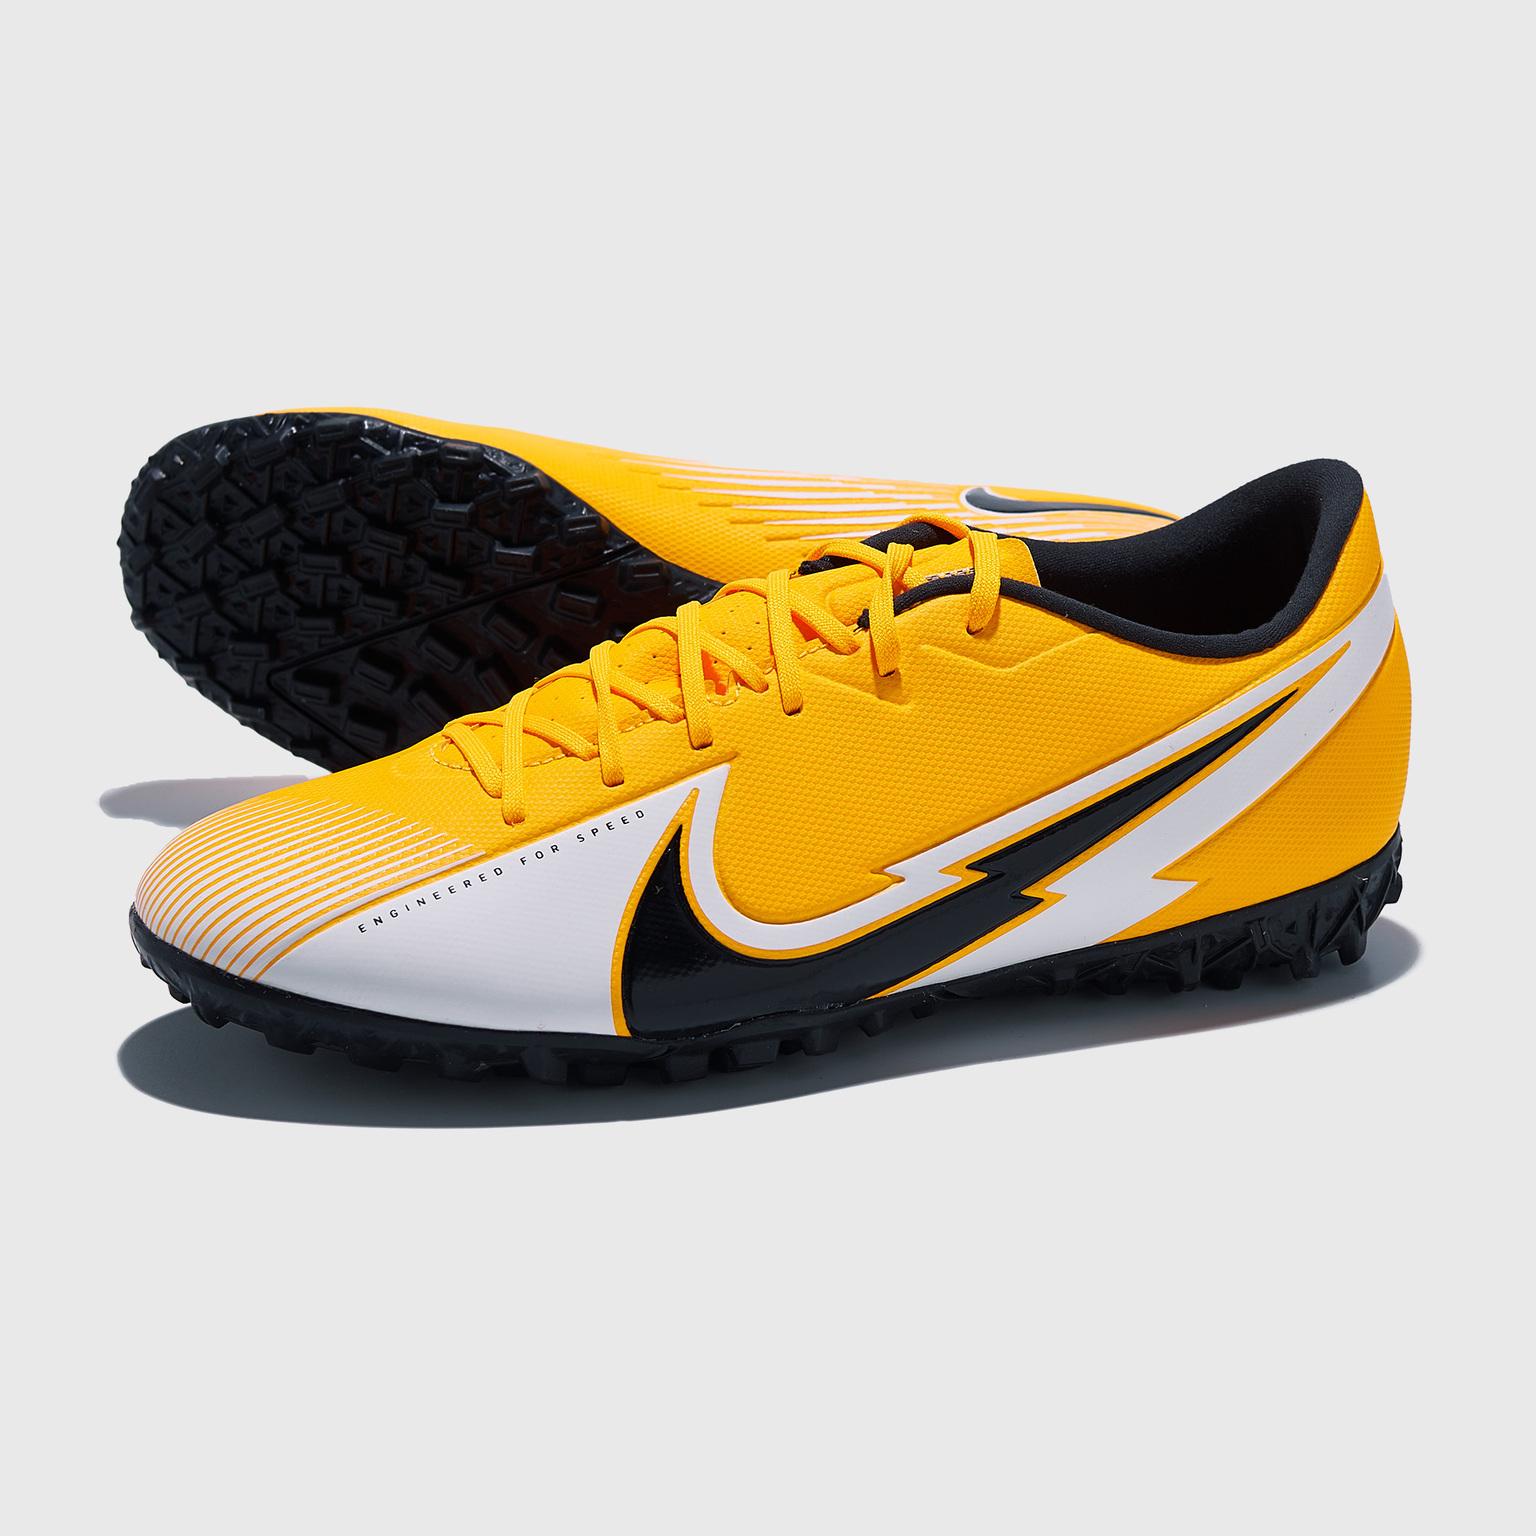 Фото - Шиповки Nike Vapor 13 Academy TF AT7996-801 шиповки детские nike vapor 13 academy neymar tf at8144 104